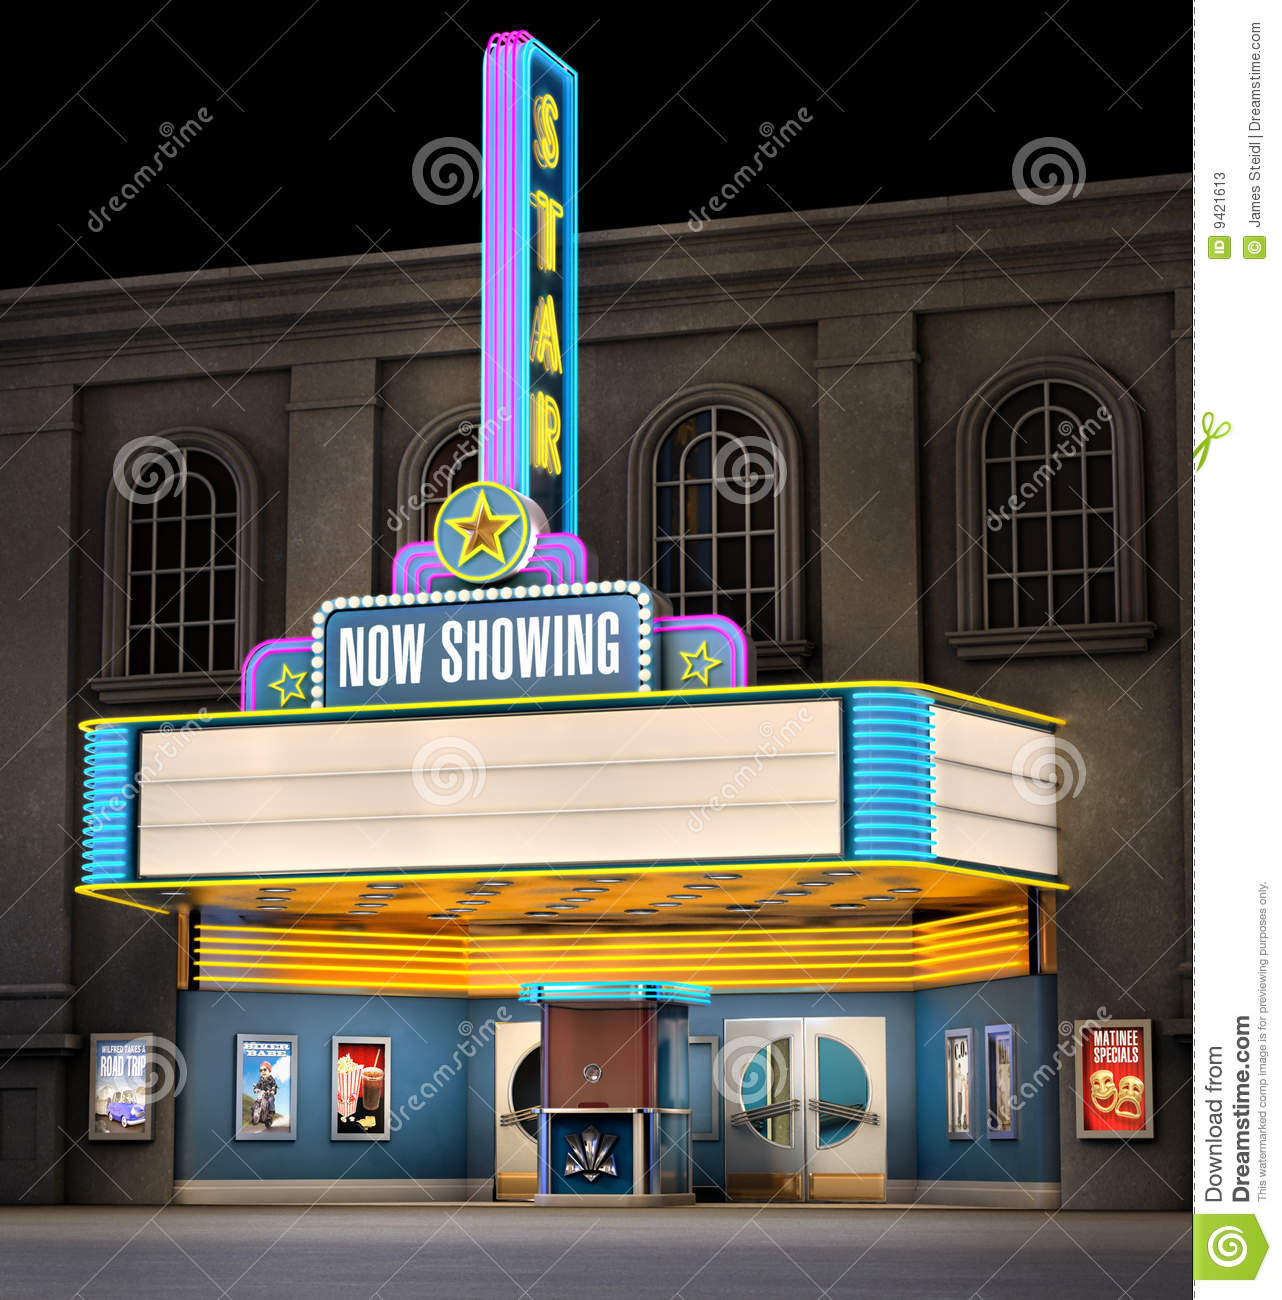 Exterior Night Shot Of A Retro Illuminated Neon Movie Theater